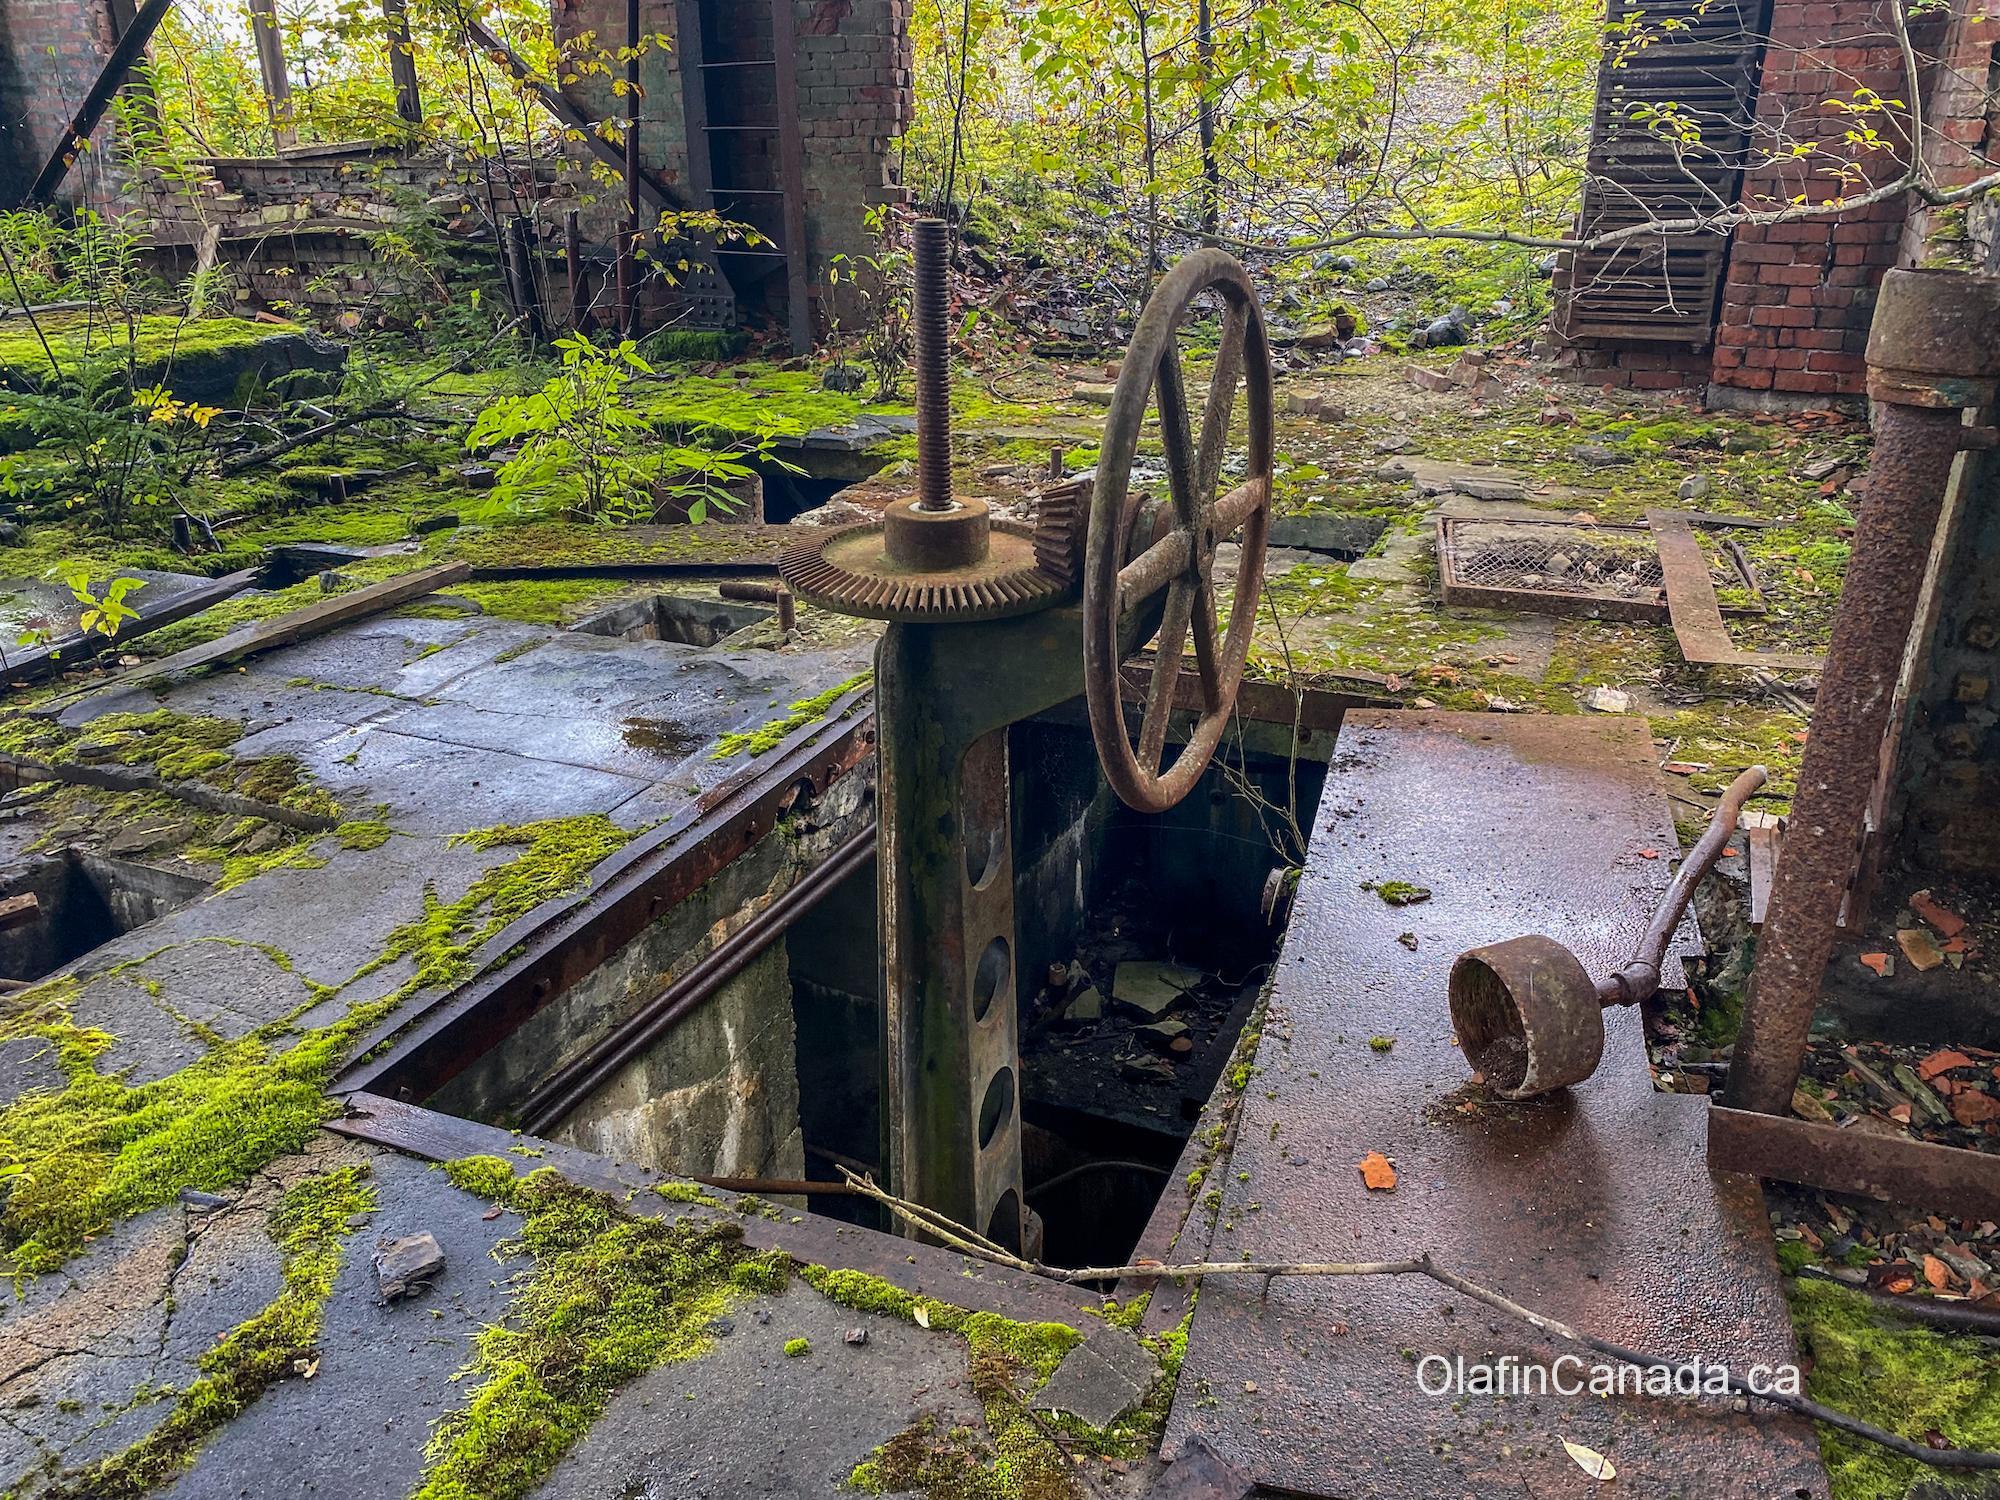 Steering wheel for the turbines inside the powerhouse No. 1 at Anyox #olafincanada #britishcolumbia #discoverbc #abandonedbc #anyox #powerhouse